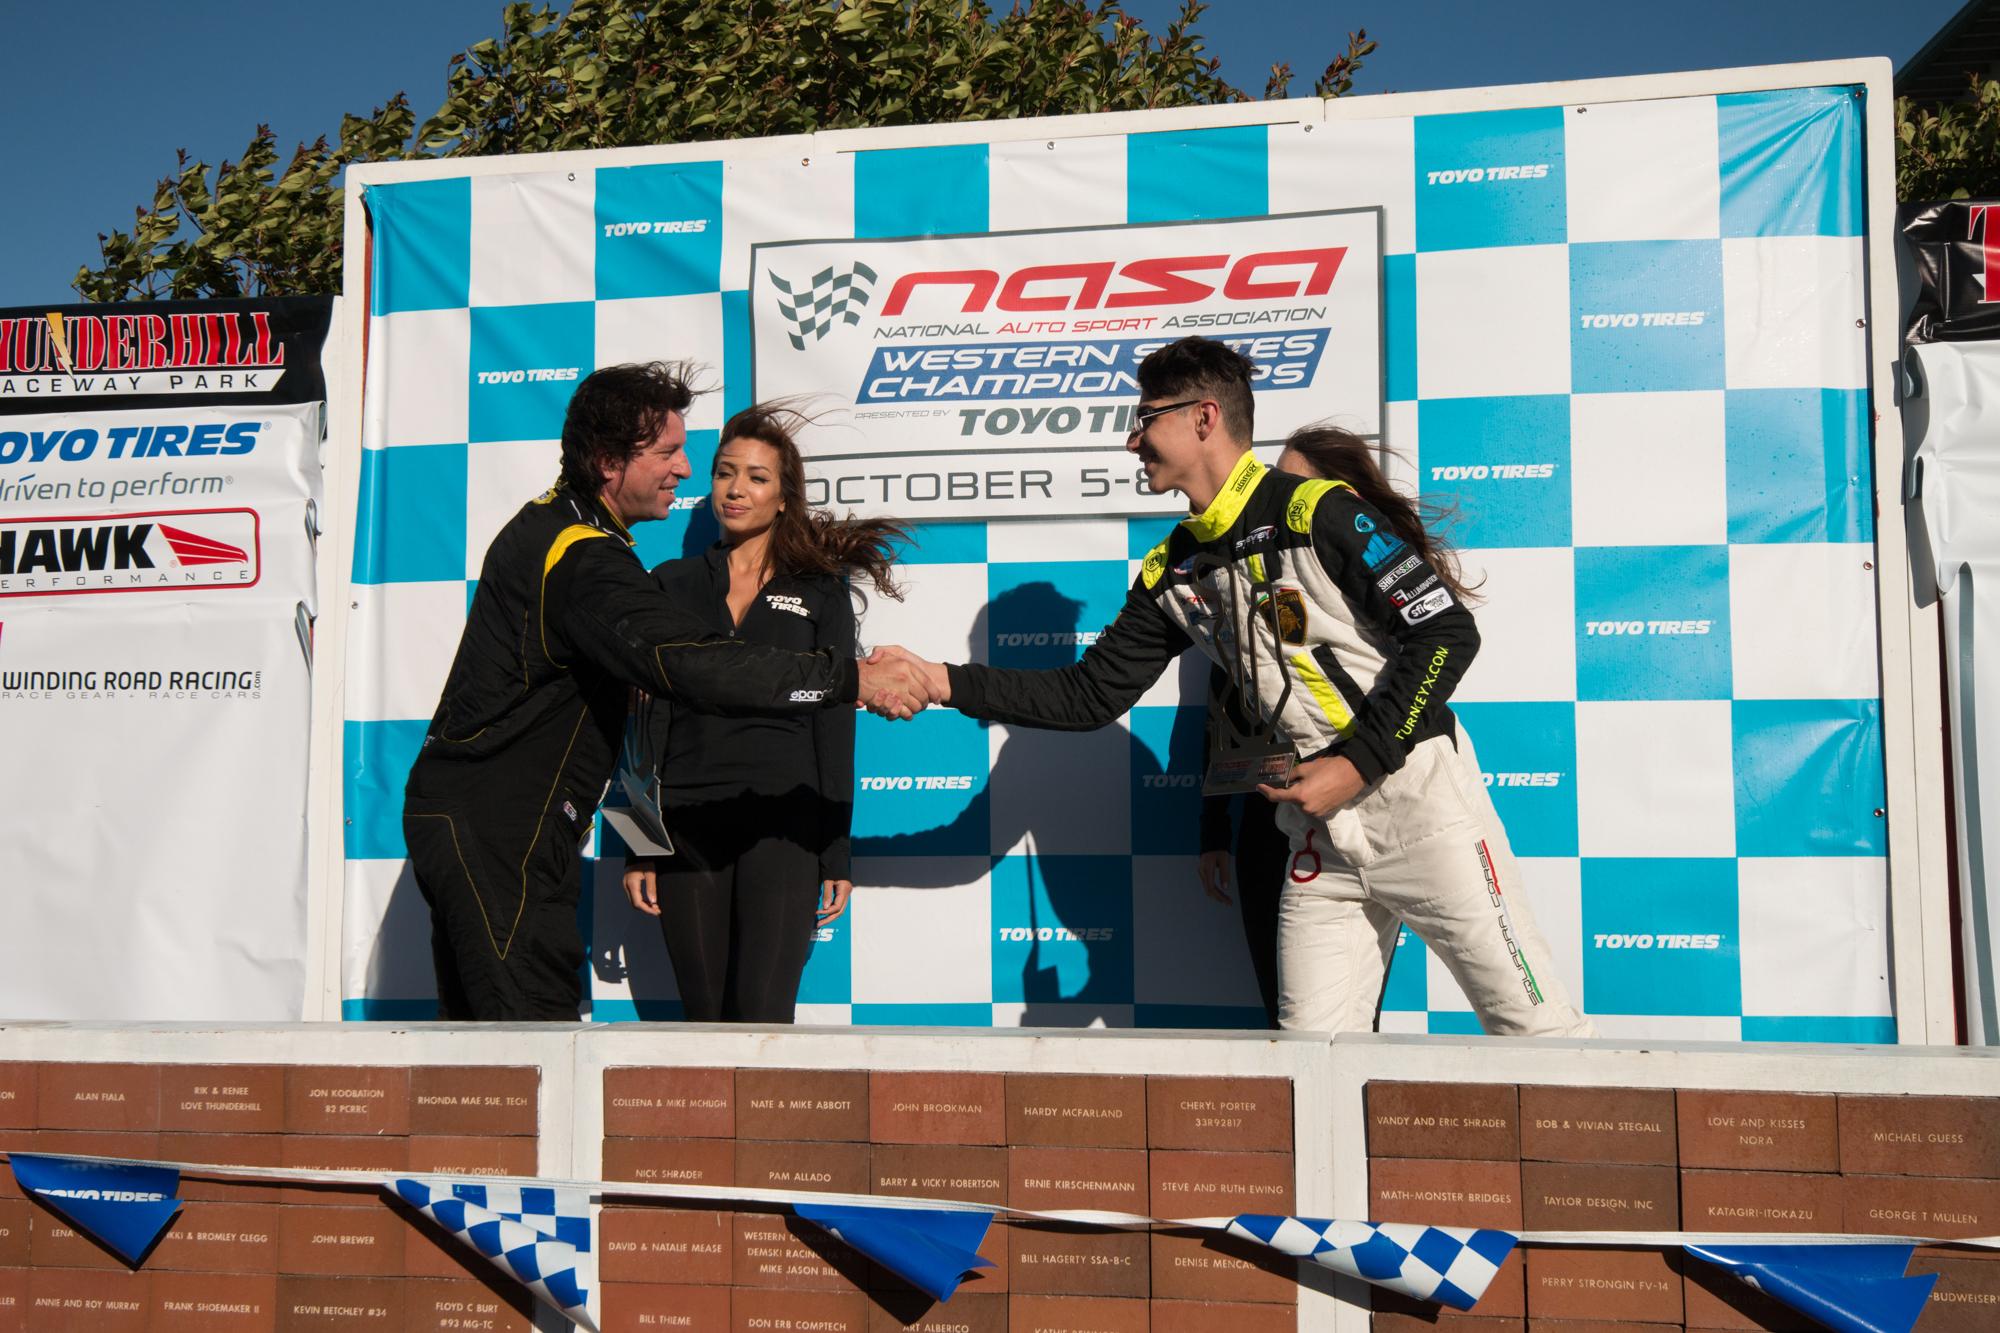 Steven-Racing-20130208-45911.jpg